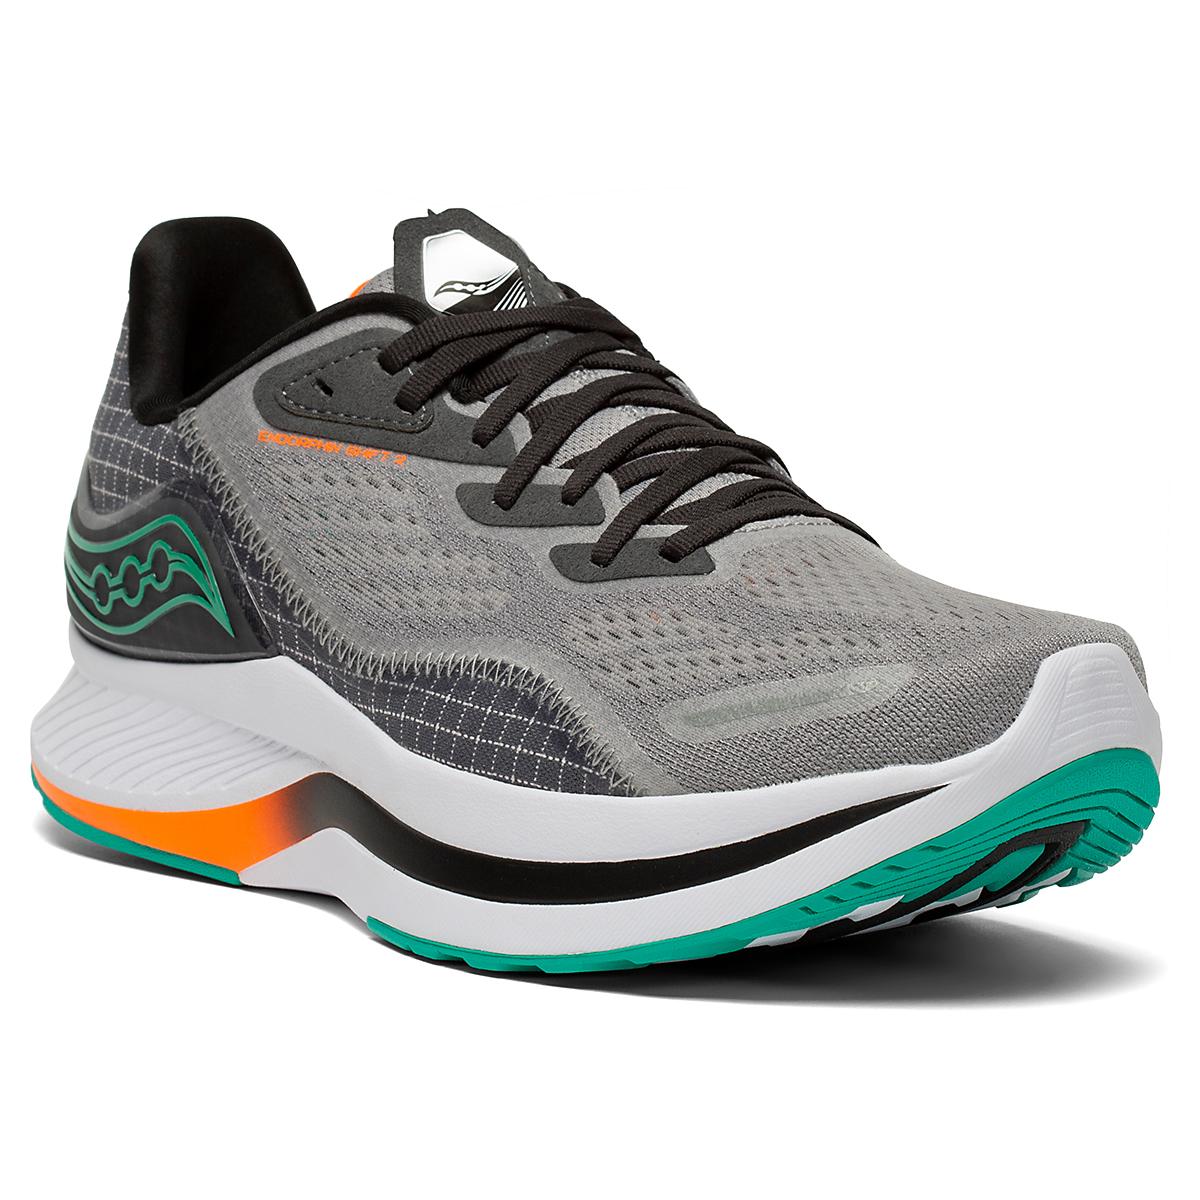 Men's Saucony Endorphin Shift 2 Running Shoe - Color: Alloy / Jade - Size: 7 - Width: Regular, Alloy / Jade, large, image 5